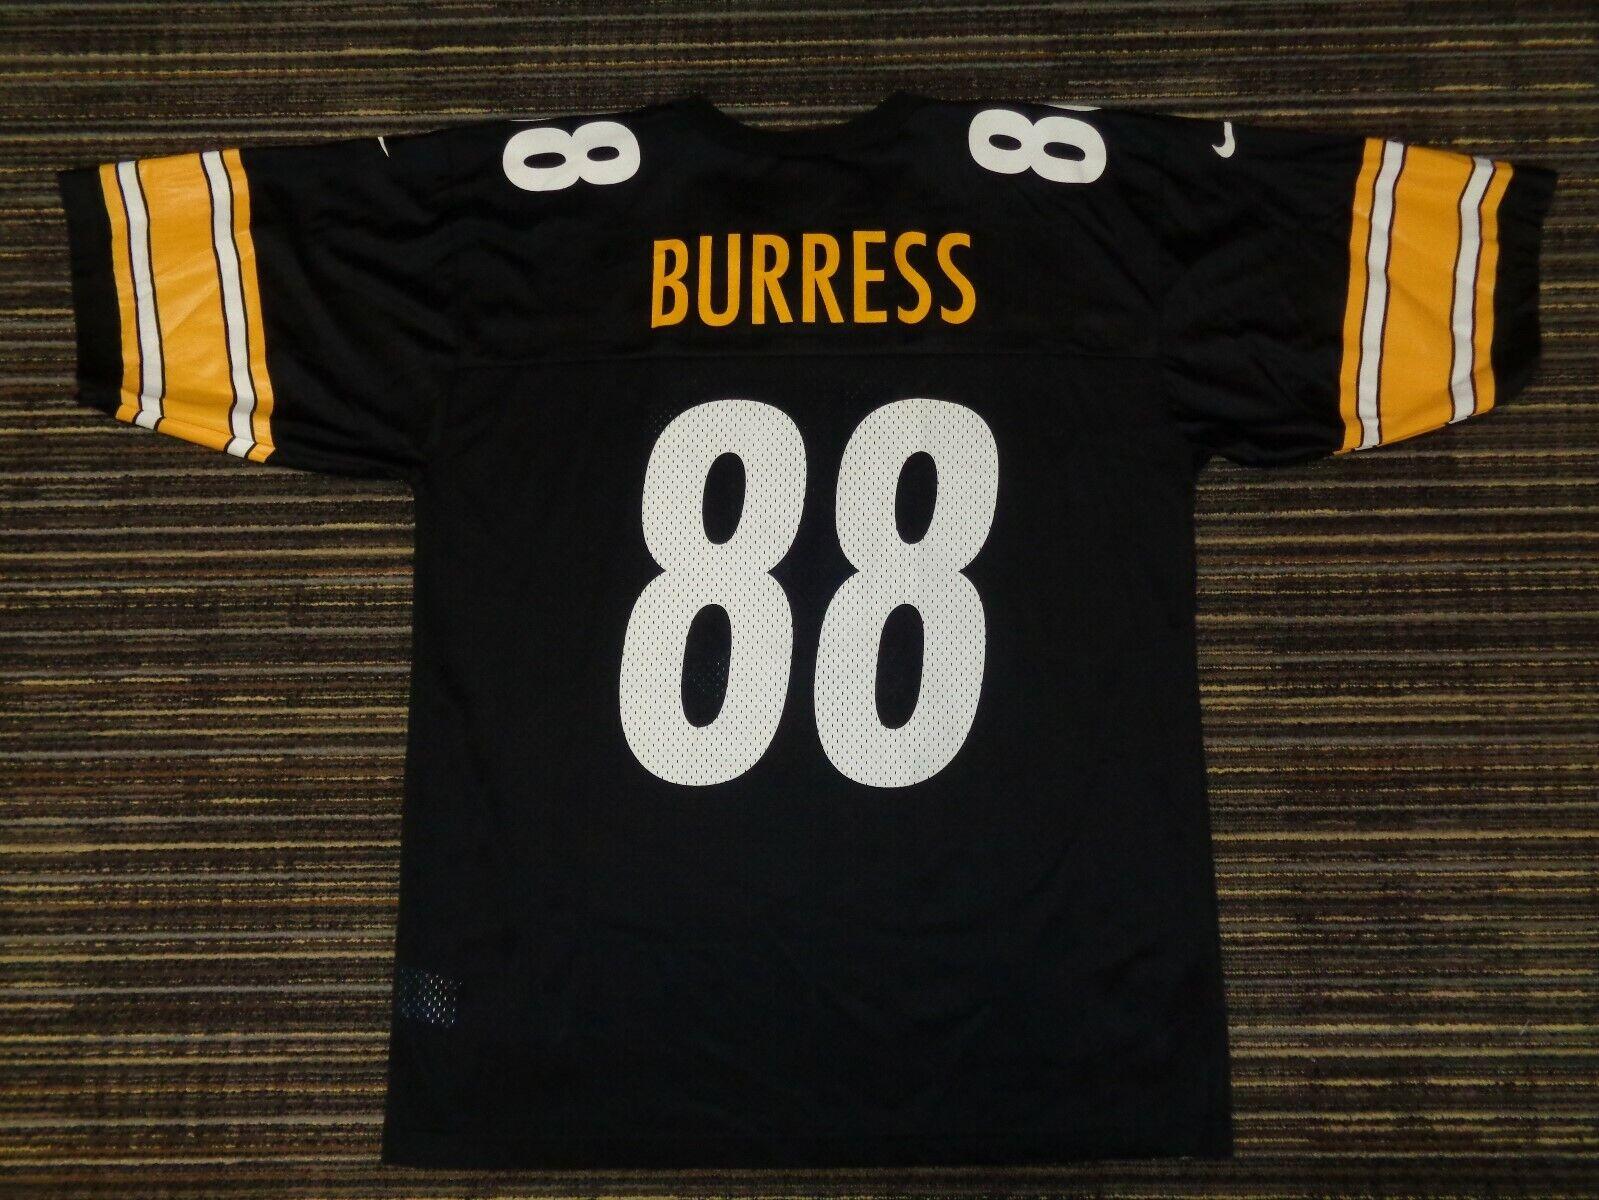 BURRESS 88 PITTSBURGH STEELERS NIKE BLACK MENS NFL GAME FOOTBALL JERSEY SZ LG - $19.99